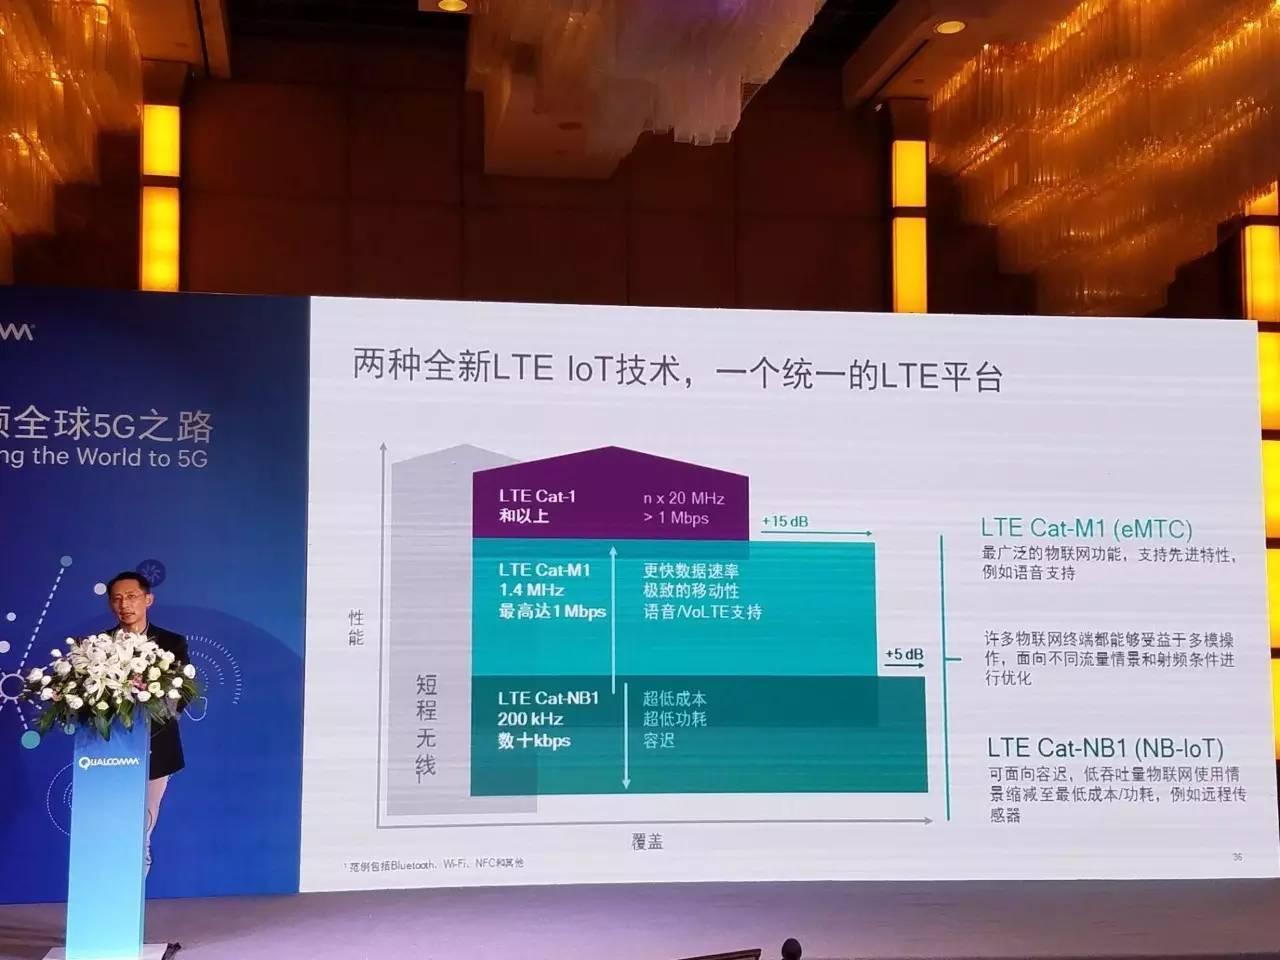 Qualcomm产品市场总监沈磊在介绍LTE物联网技术